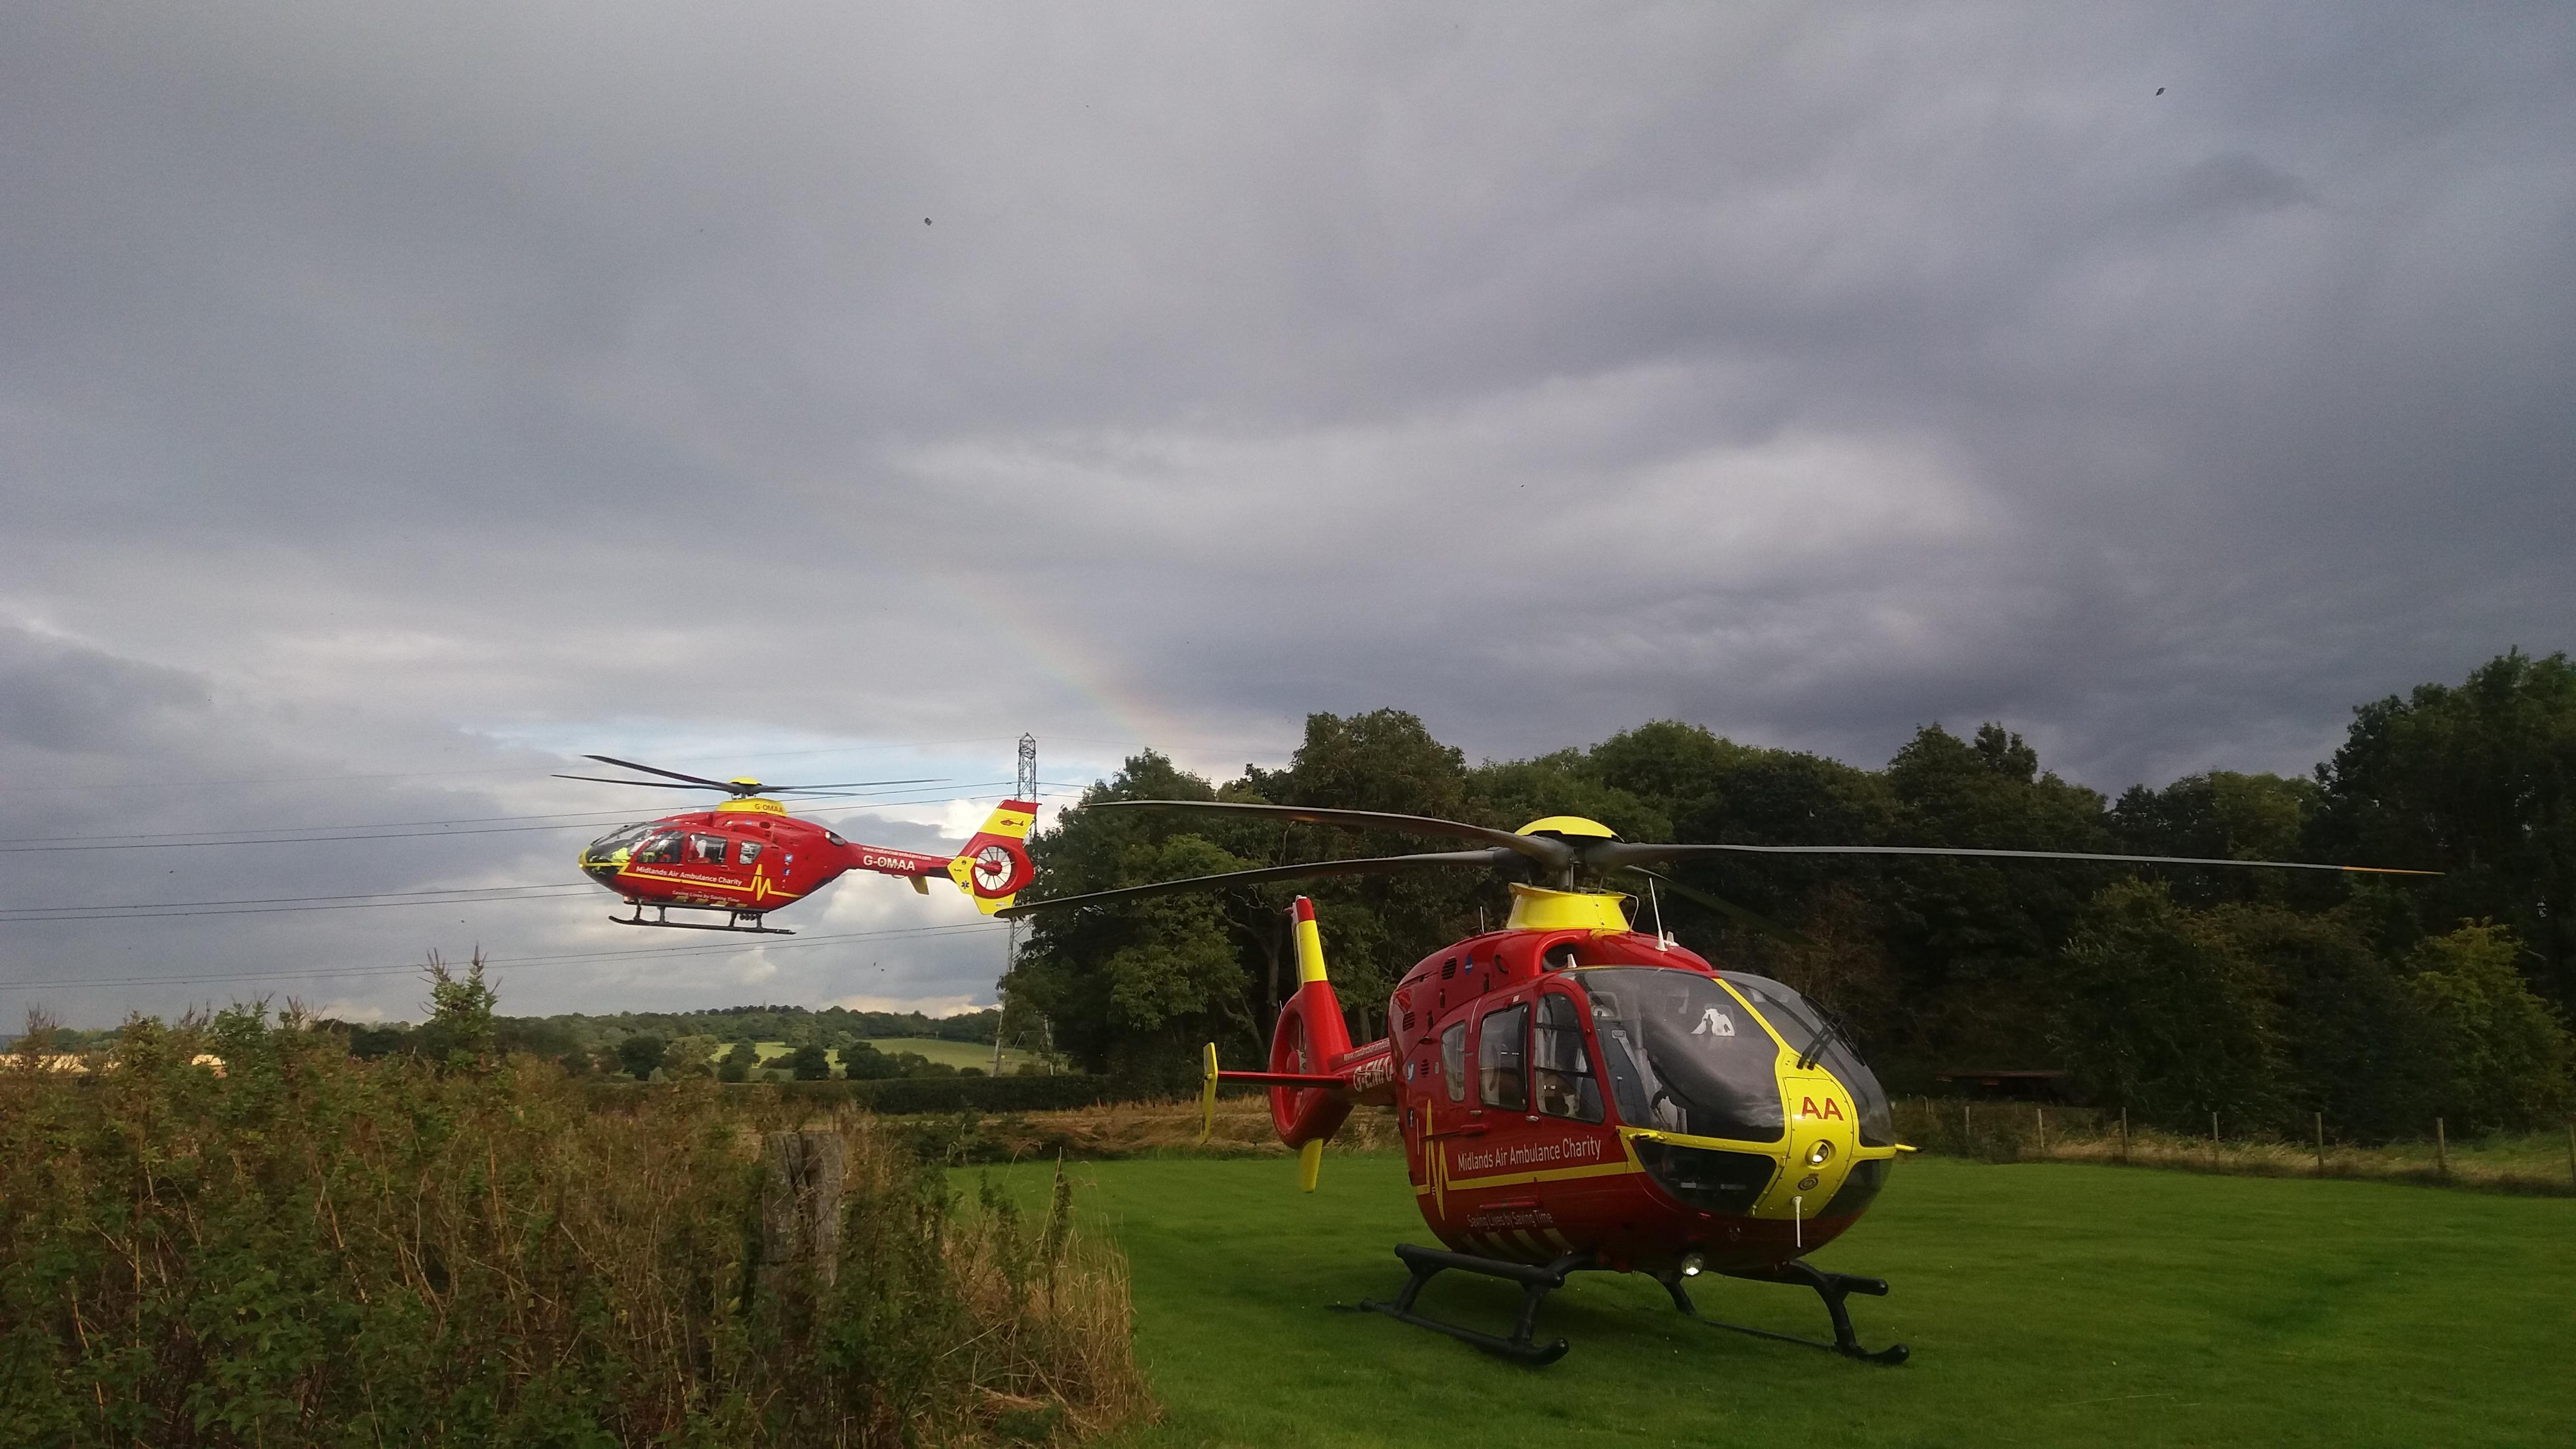 2 x MAA helicopters